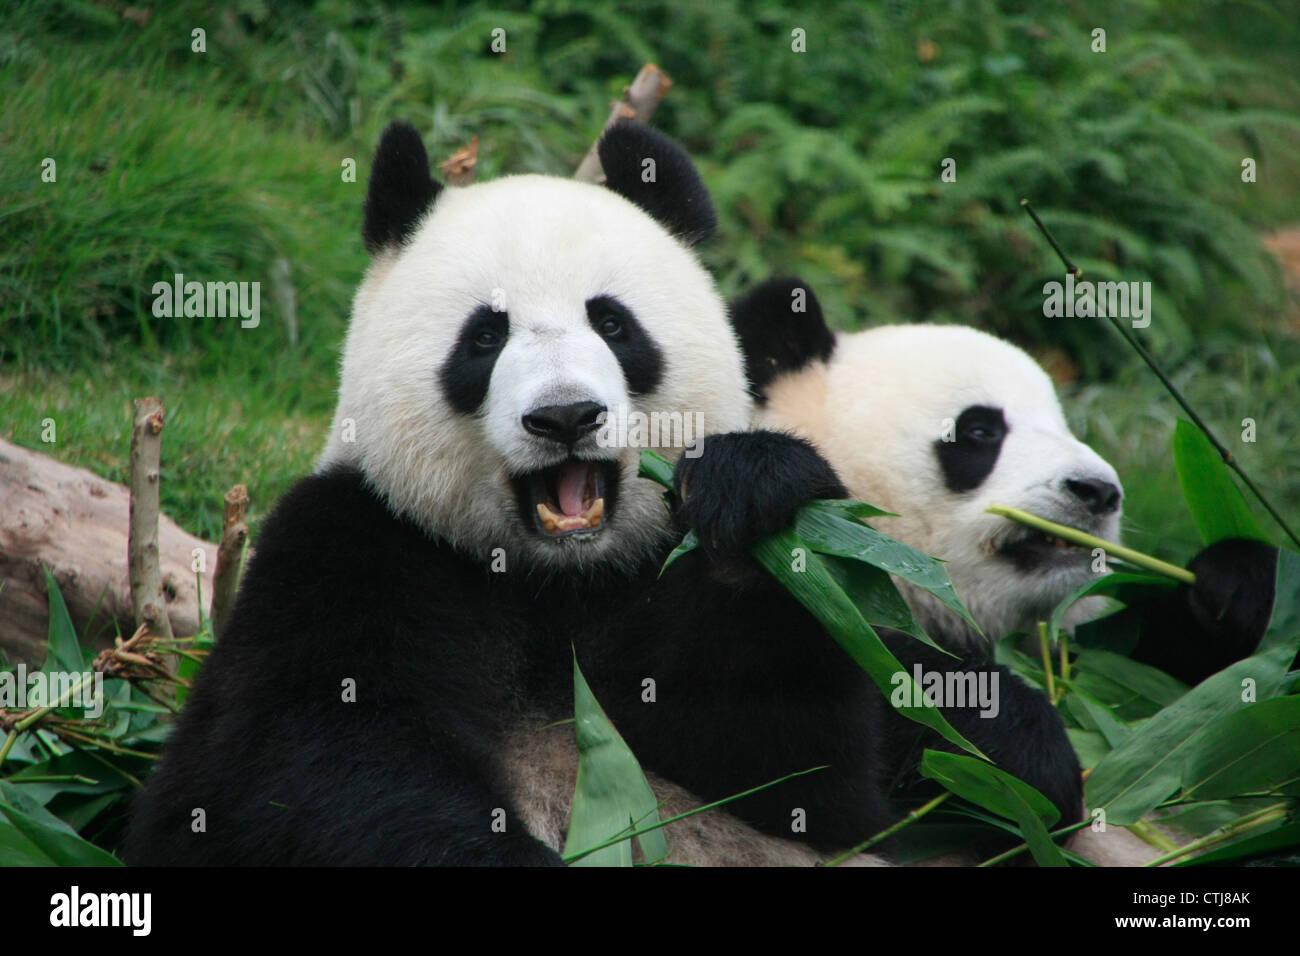 El Oso Panda Gigante (Ailuropoda Melanoleuca Comiendo